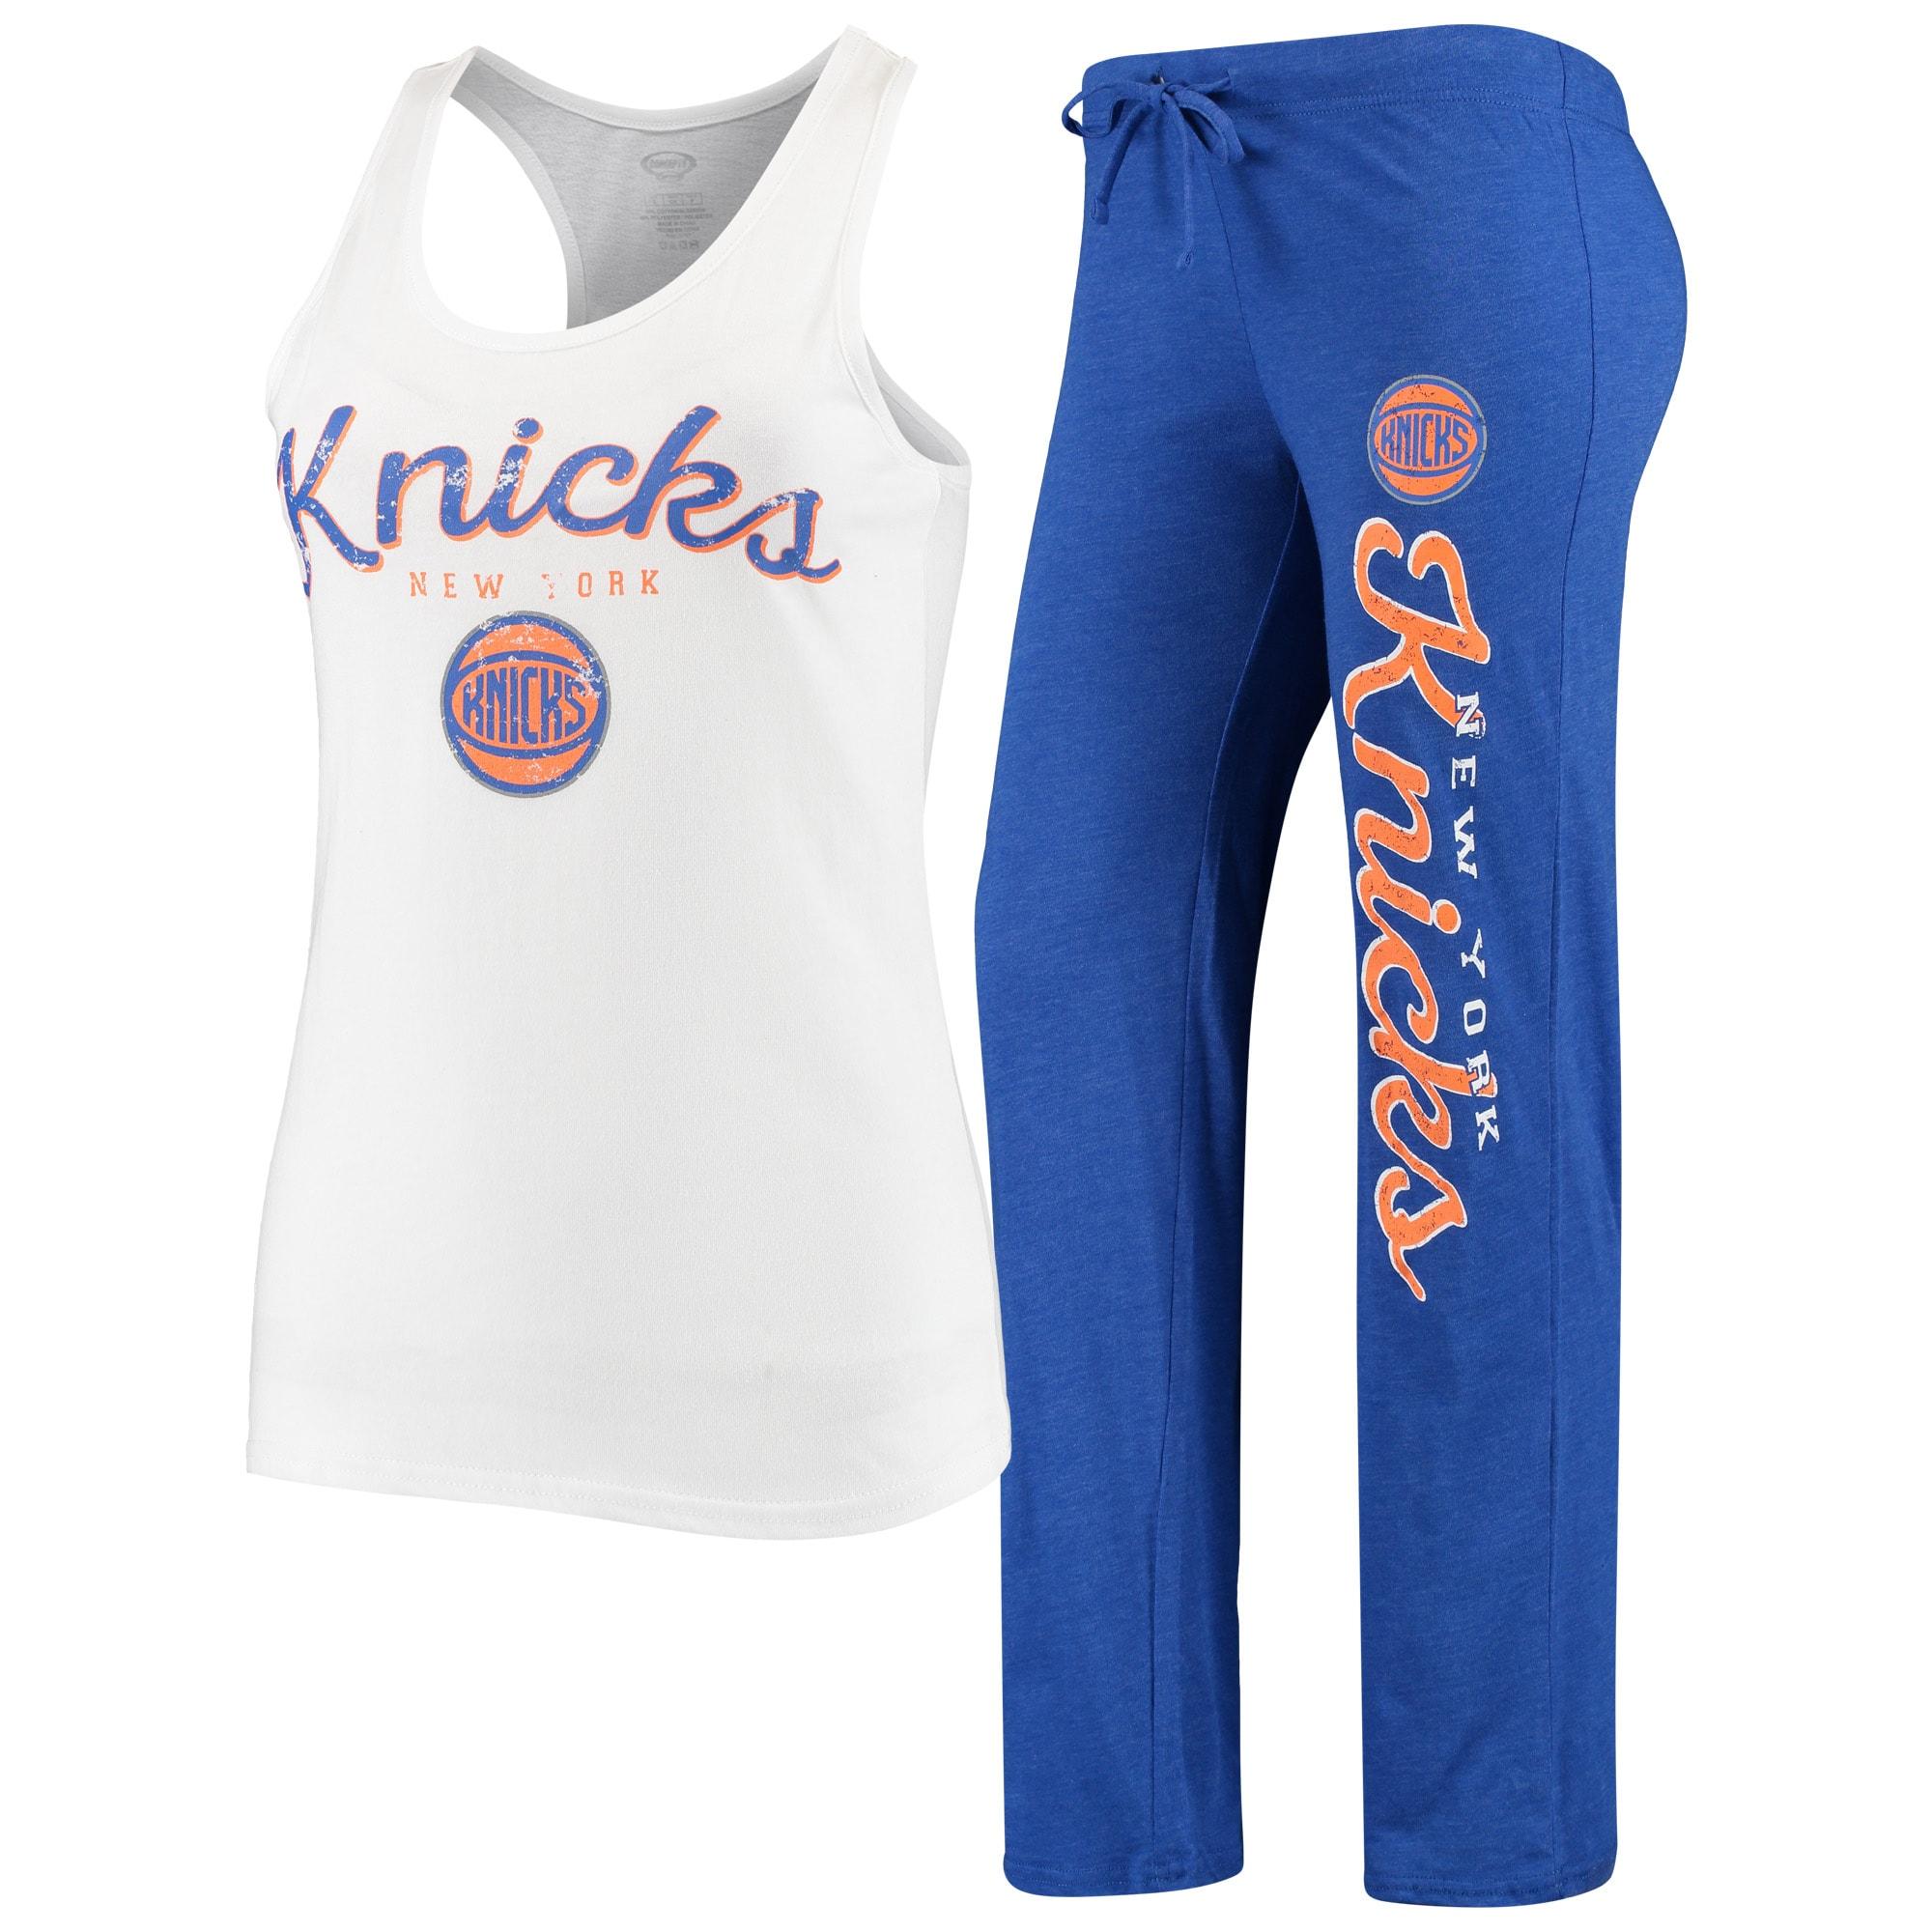 New York Knicks Concepts Sport Women's Topic Tank Top & Pants Sleep Set - White/Blue